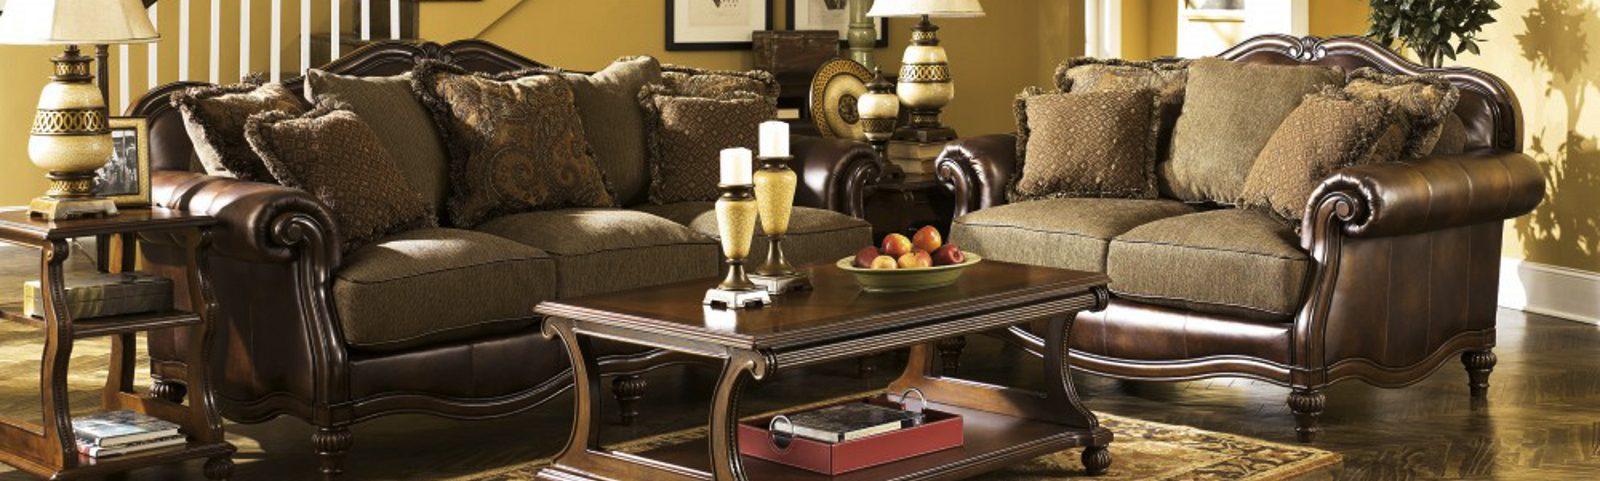 Cropped Elegant Budget Furniture In Milwaukee